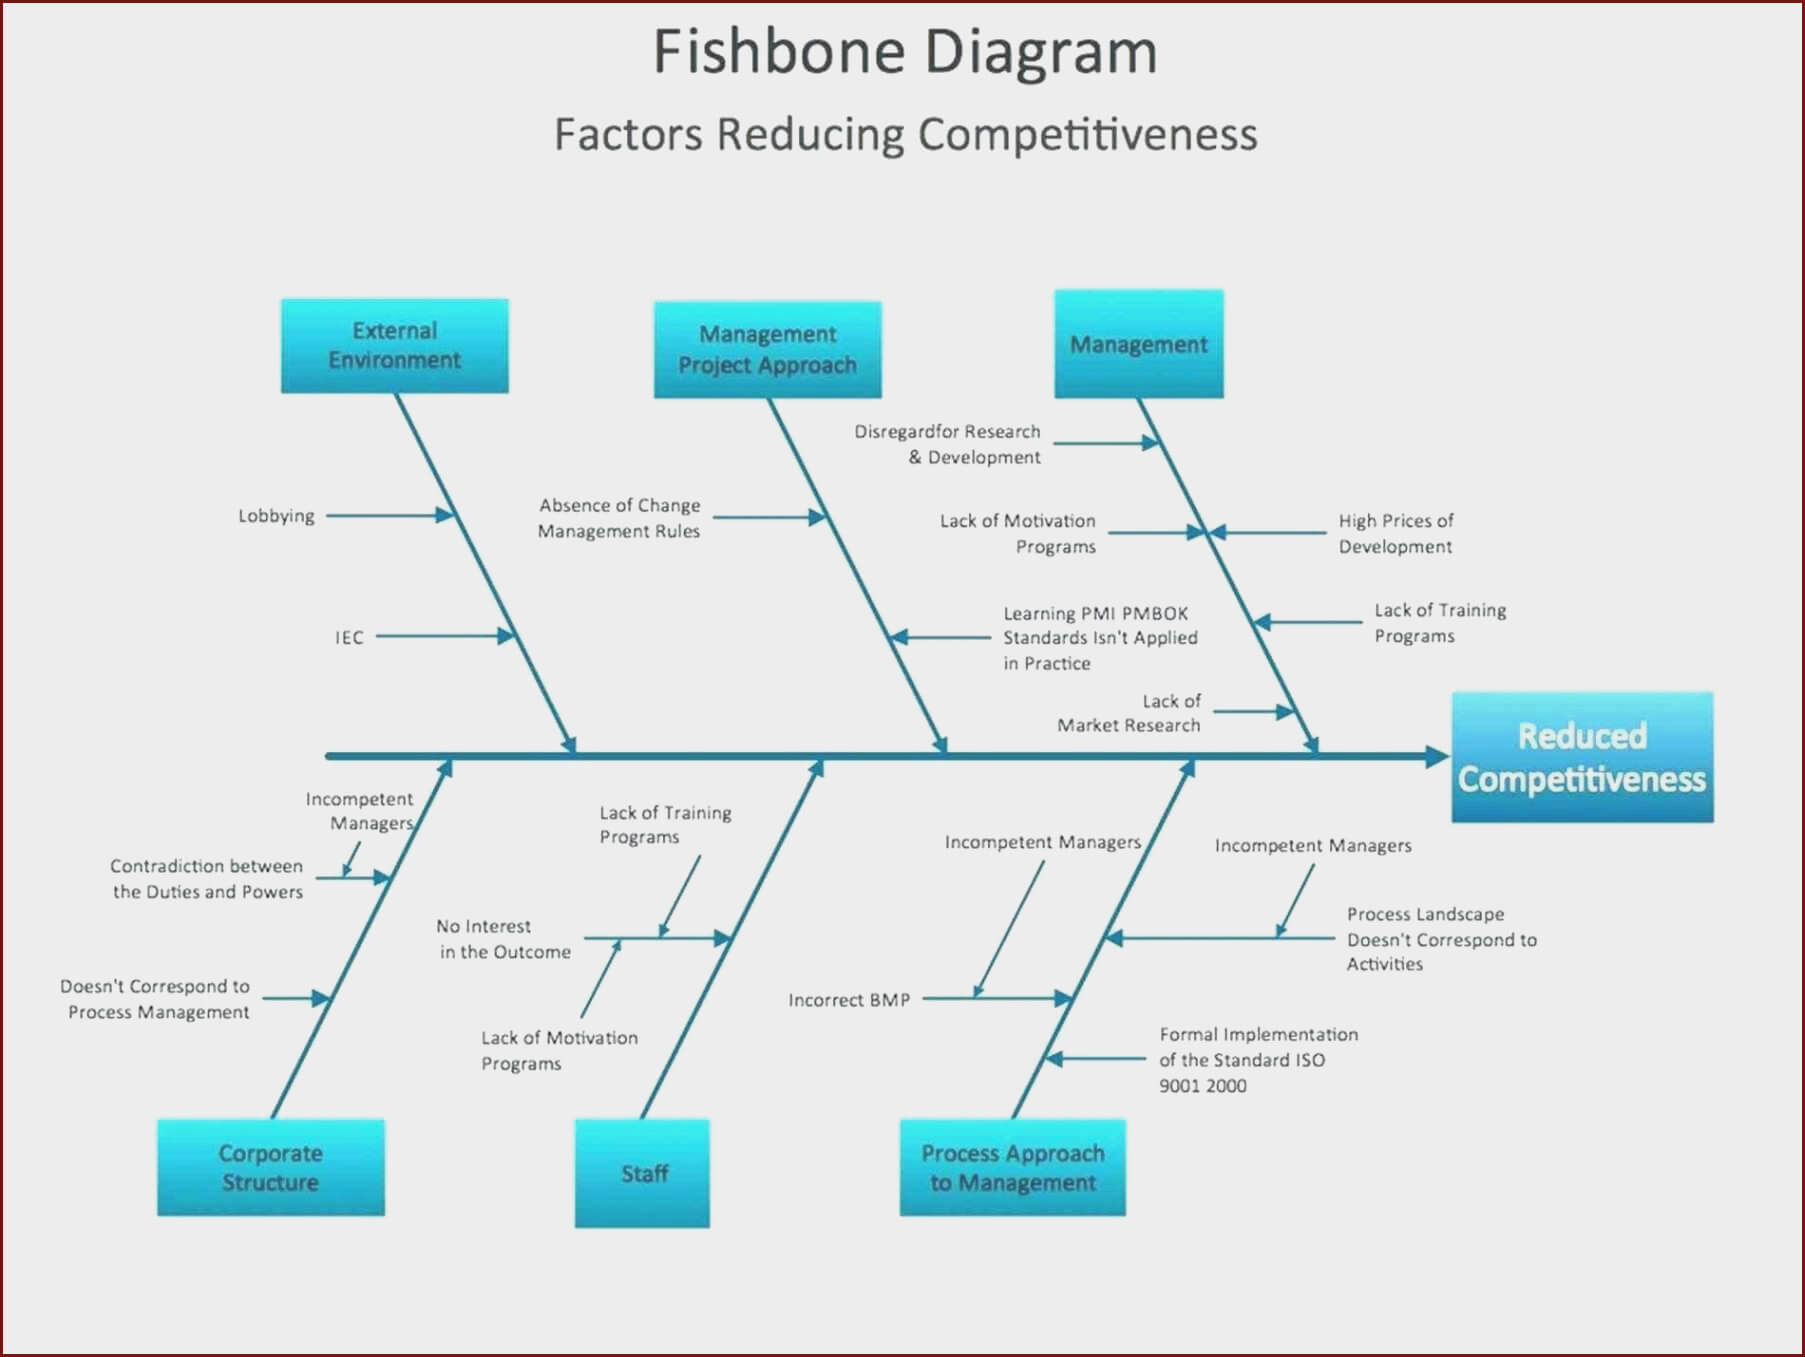 Fishbone Ishikawa Diagram Template At Manuals Library For Ishikawa Diagram Template Word